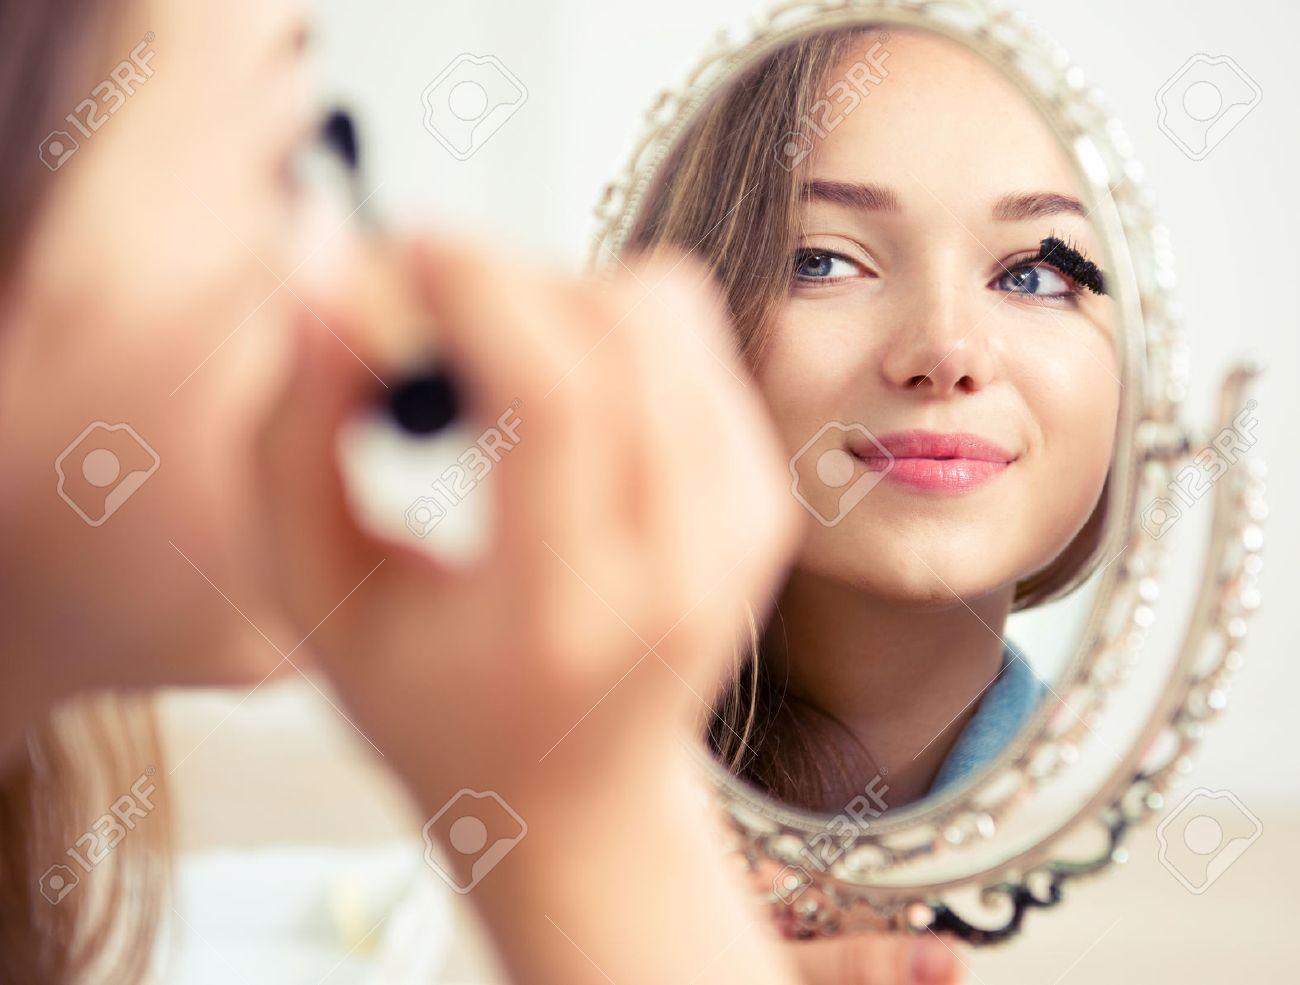 Beauty model teenage girl looking in the mirror and applying mascara - 42724222